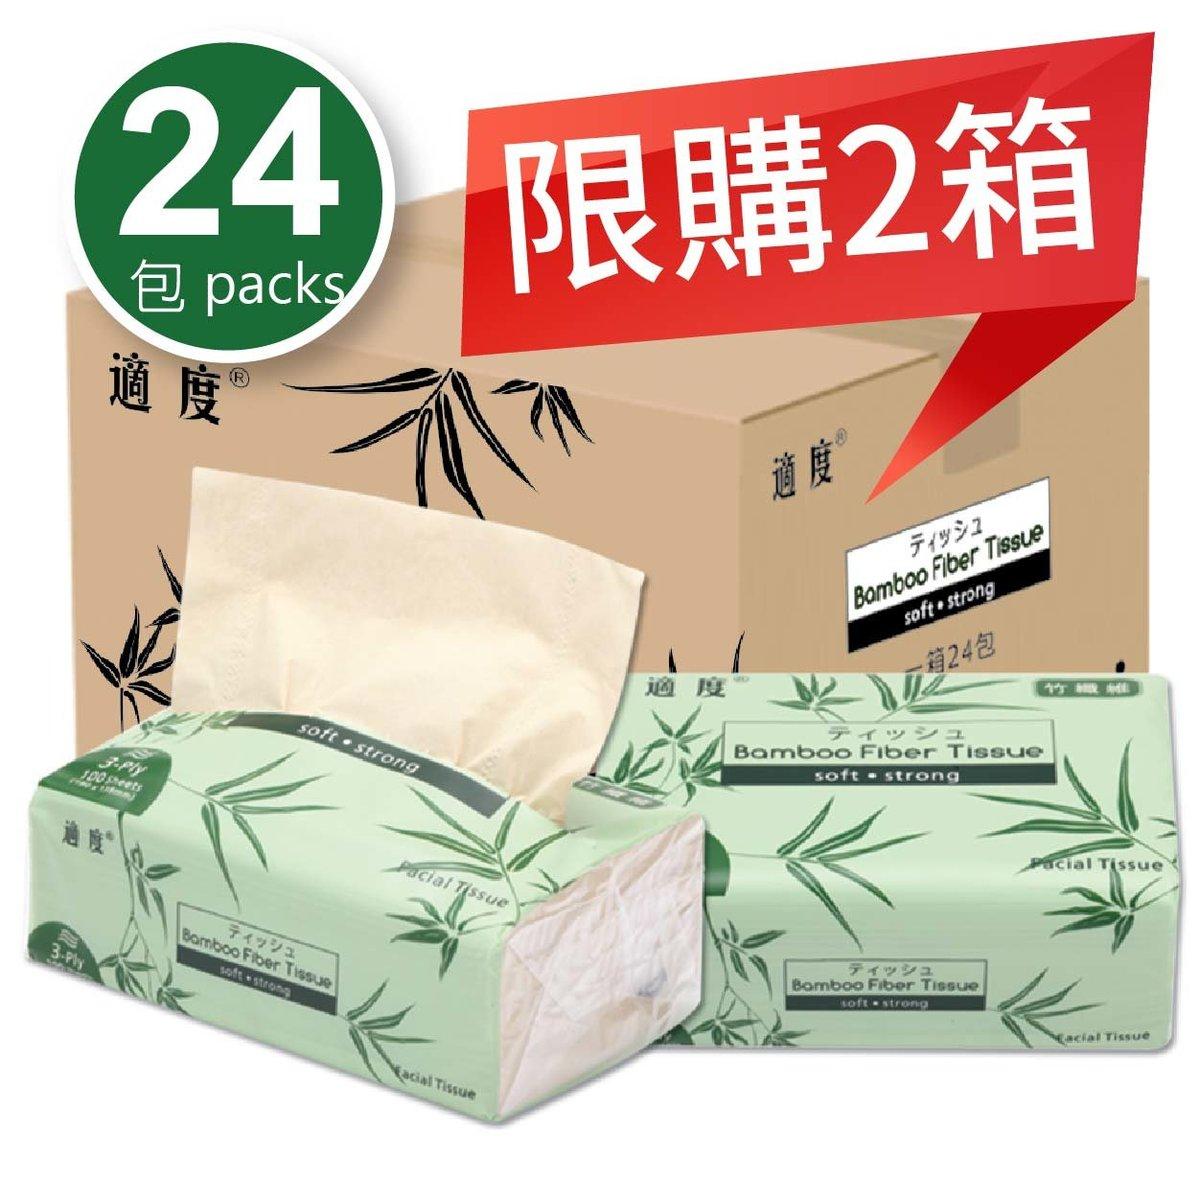 3-ply Bamboo Fiber Facial Tissue - 24 packs